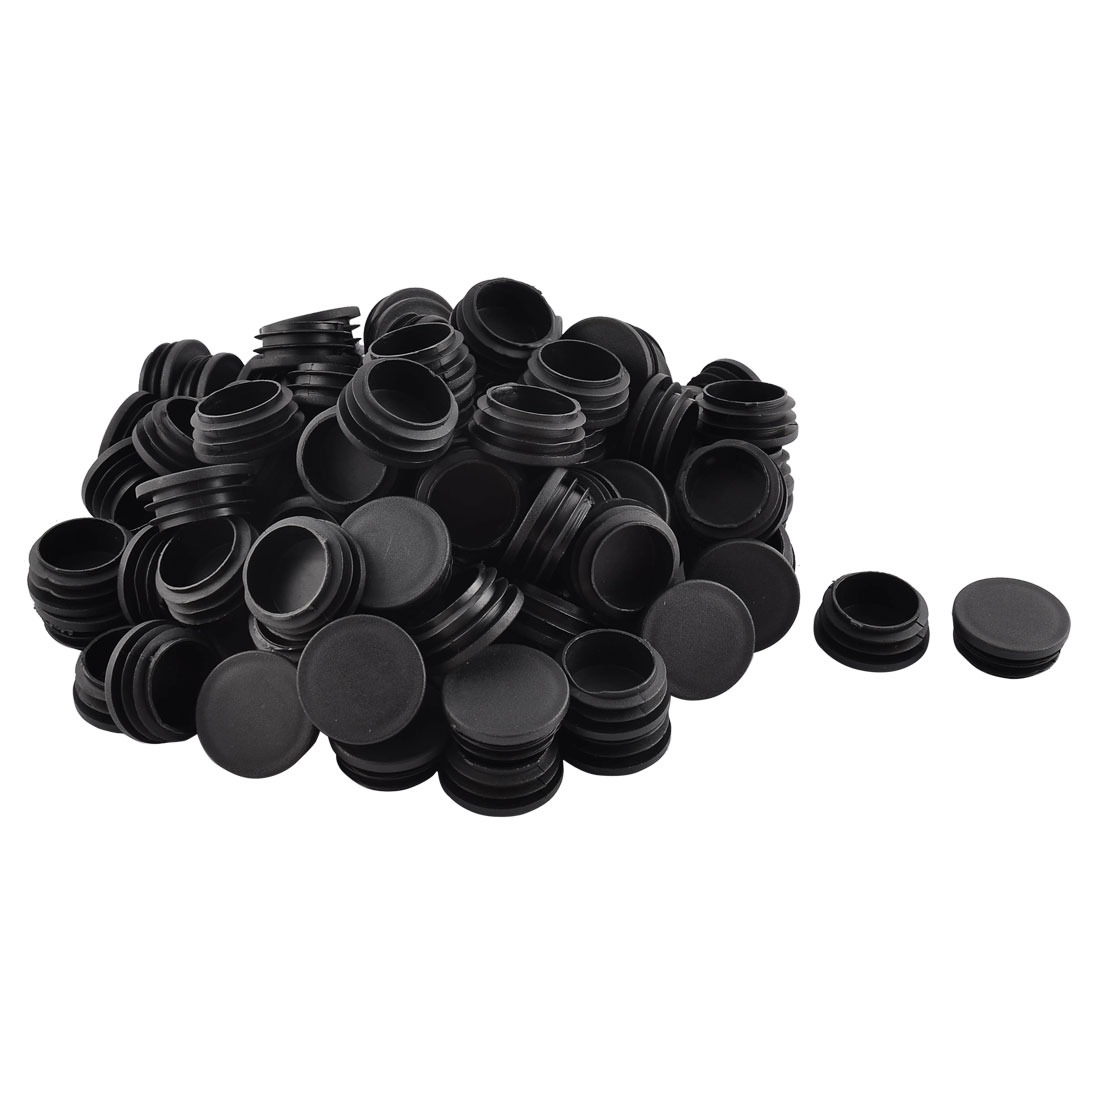 Plastic Round Shaped Furniture Table Chair Leg Feet Tube Insert Black 100 Pcs